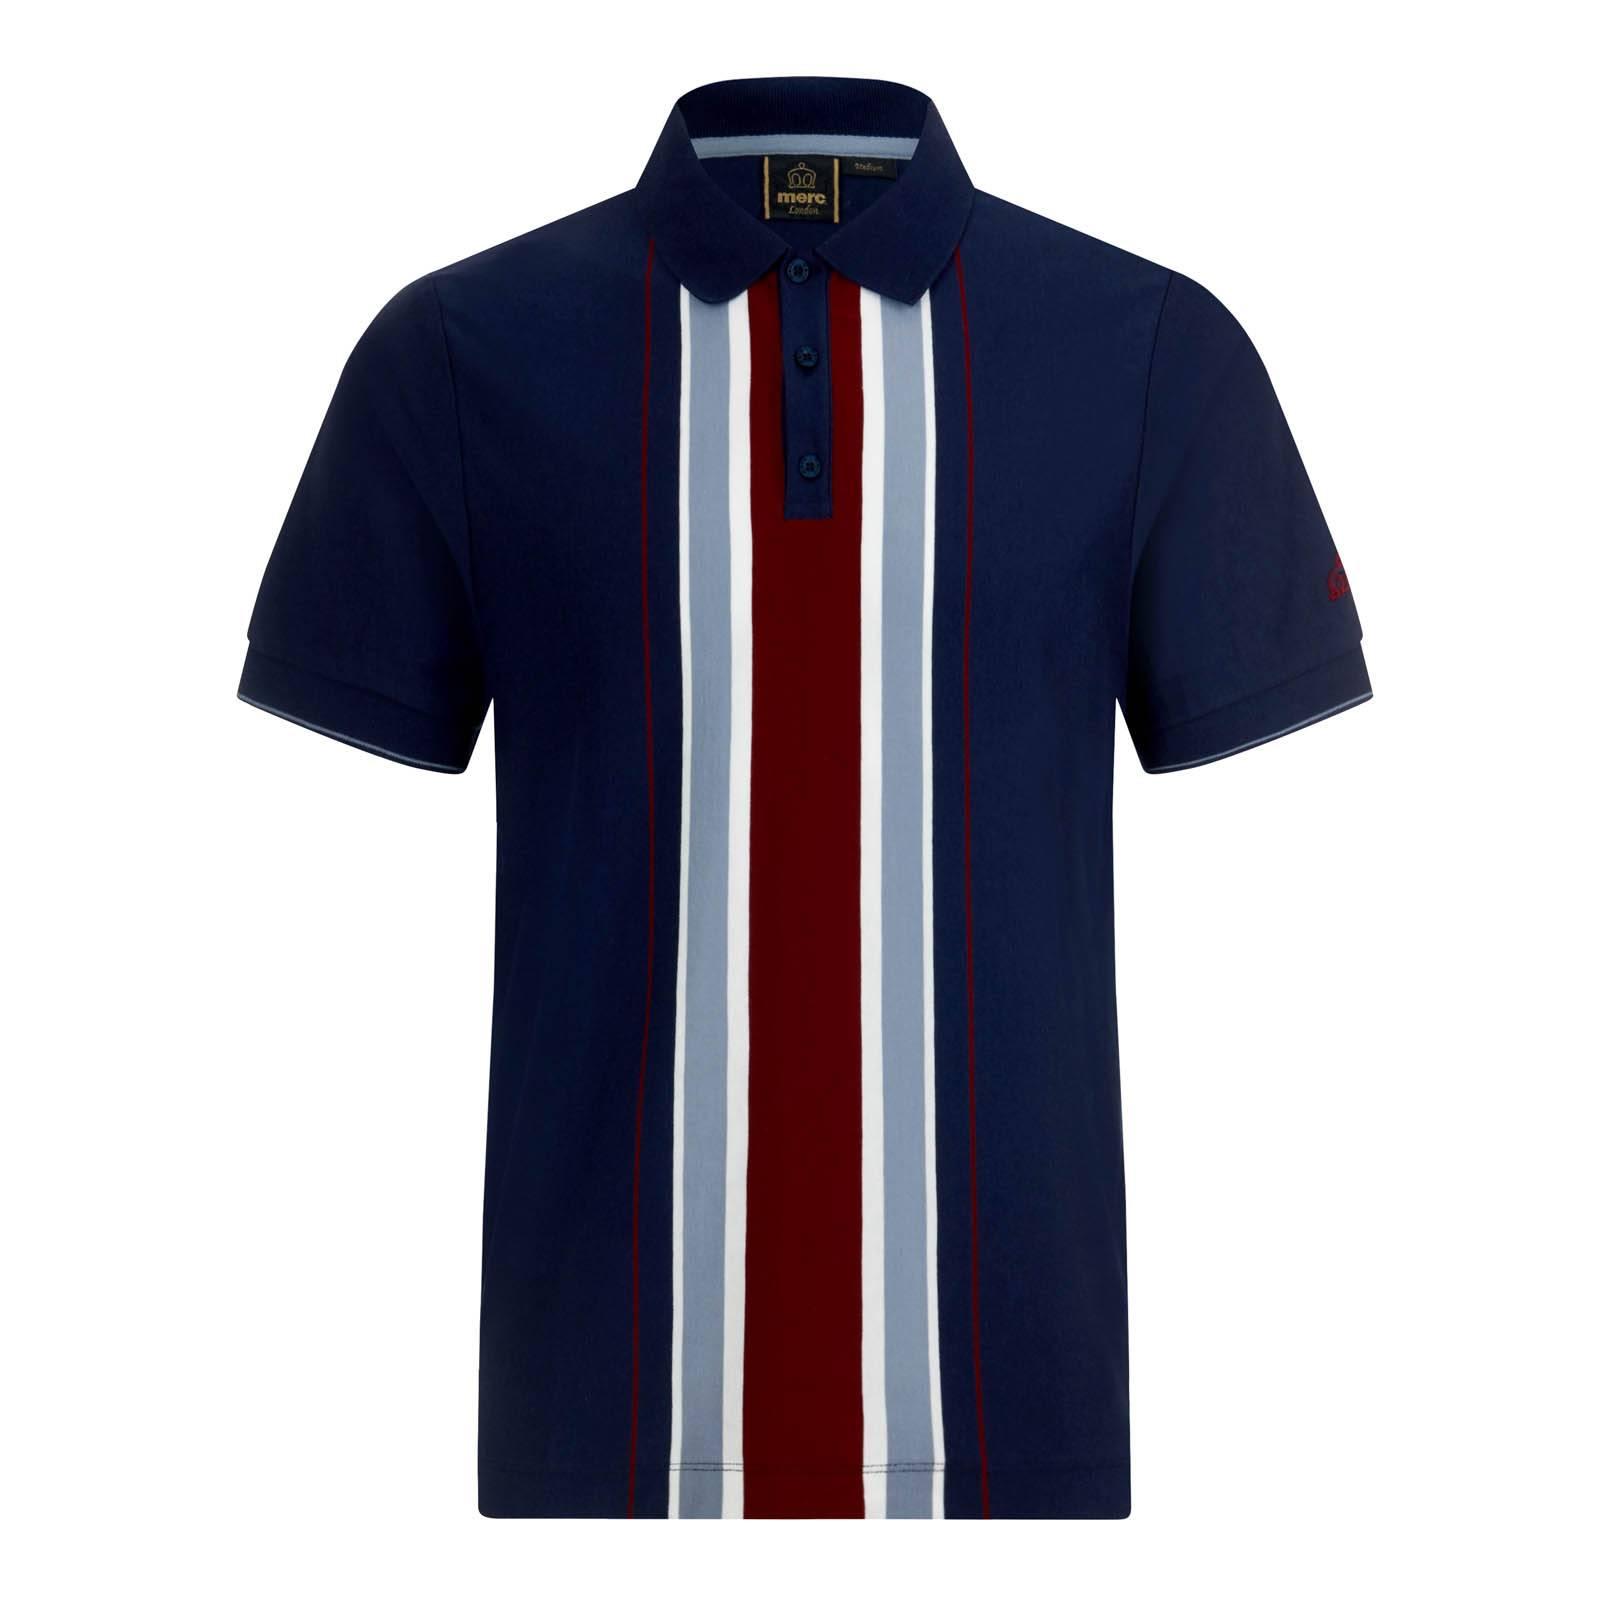 Рубашка Поло HessleПоло<br><br><br>Артикул: 1916202<br>Материал: 100% хлопок<br>Цвет: синий<br>Пол: Мужской